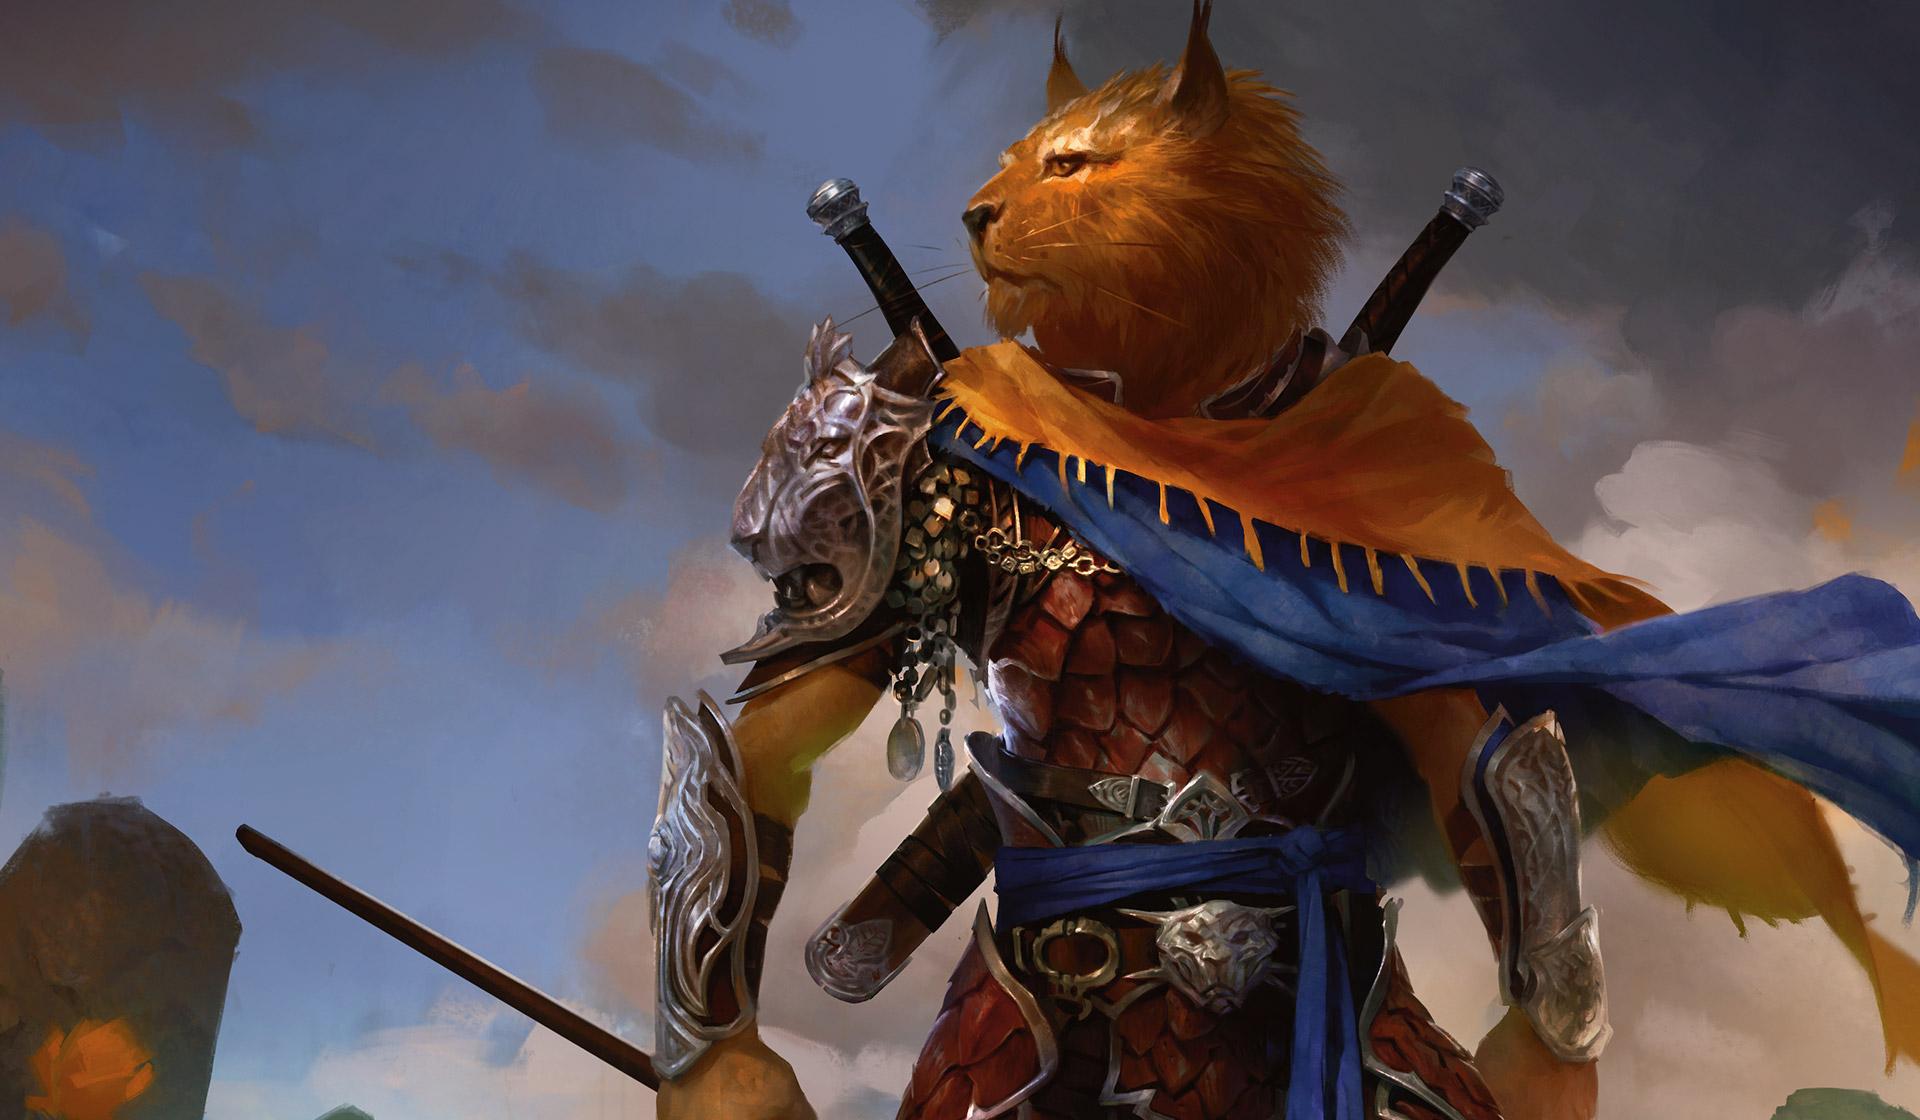 Balan Wandering Knight EDH Commander Deck